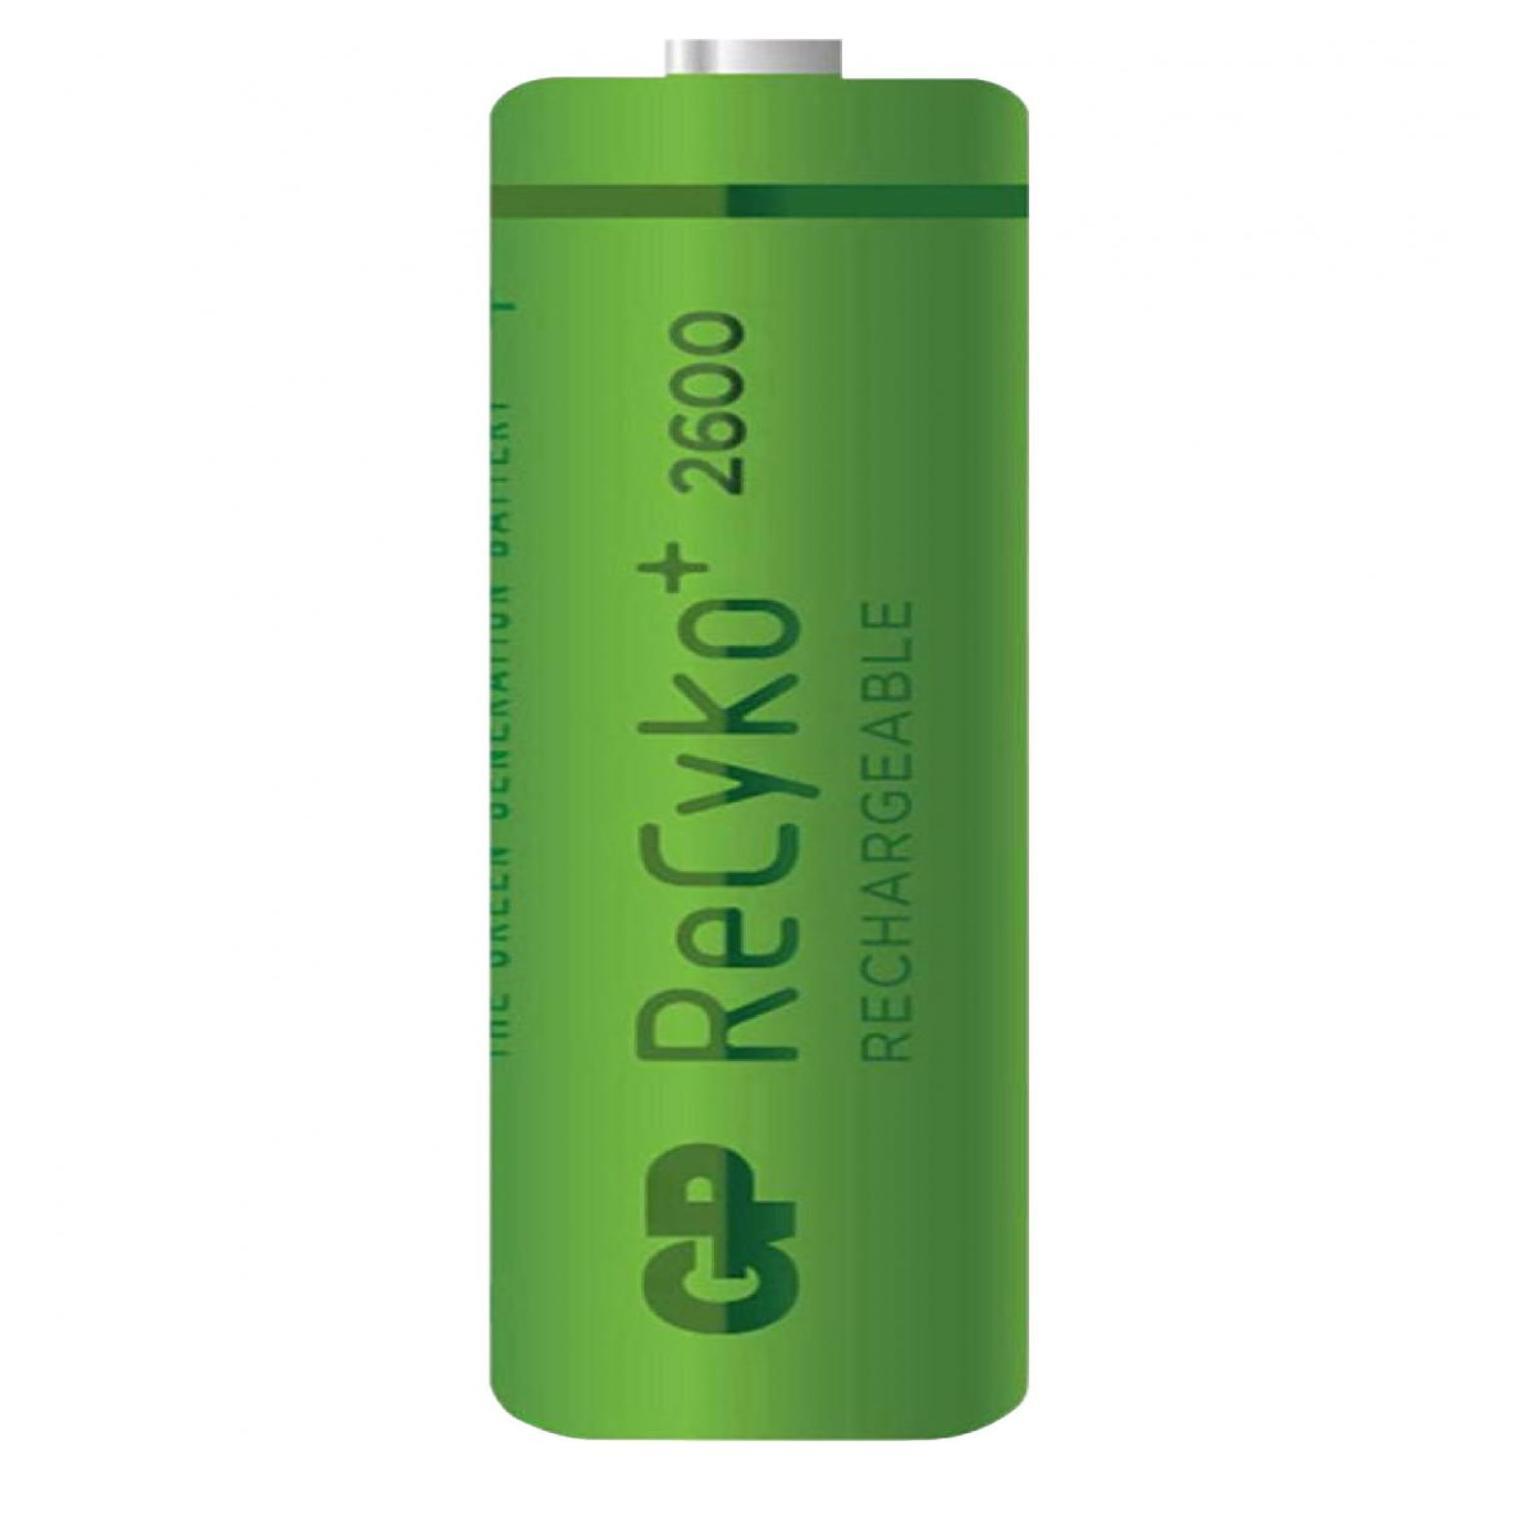 GP Batteries NiMH2700 AA mignon 1.2V 4stuks